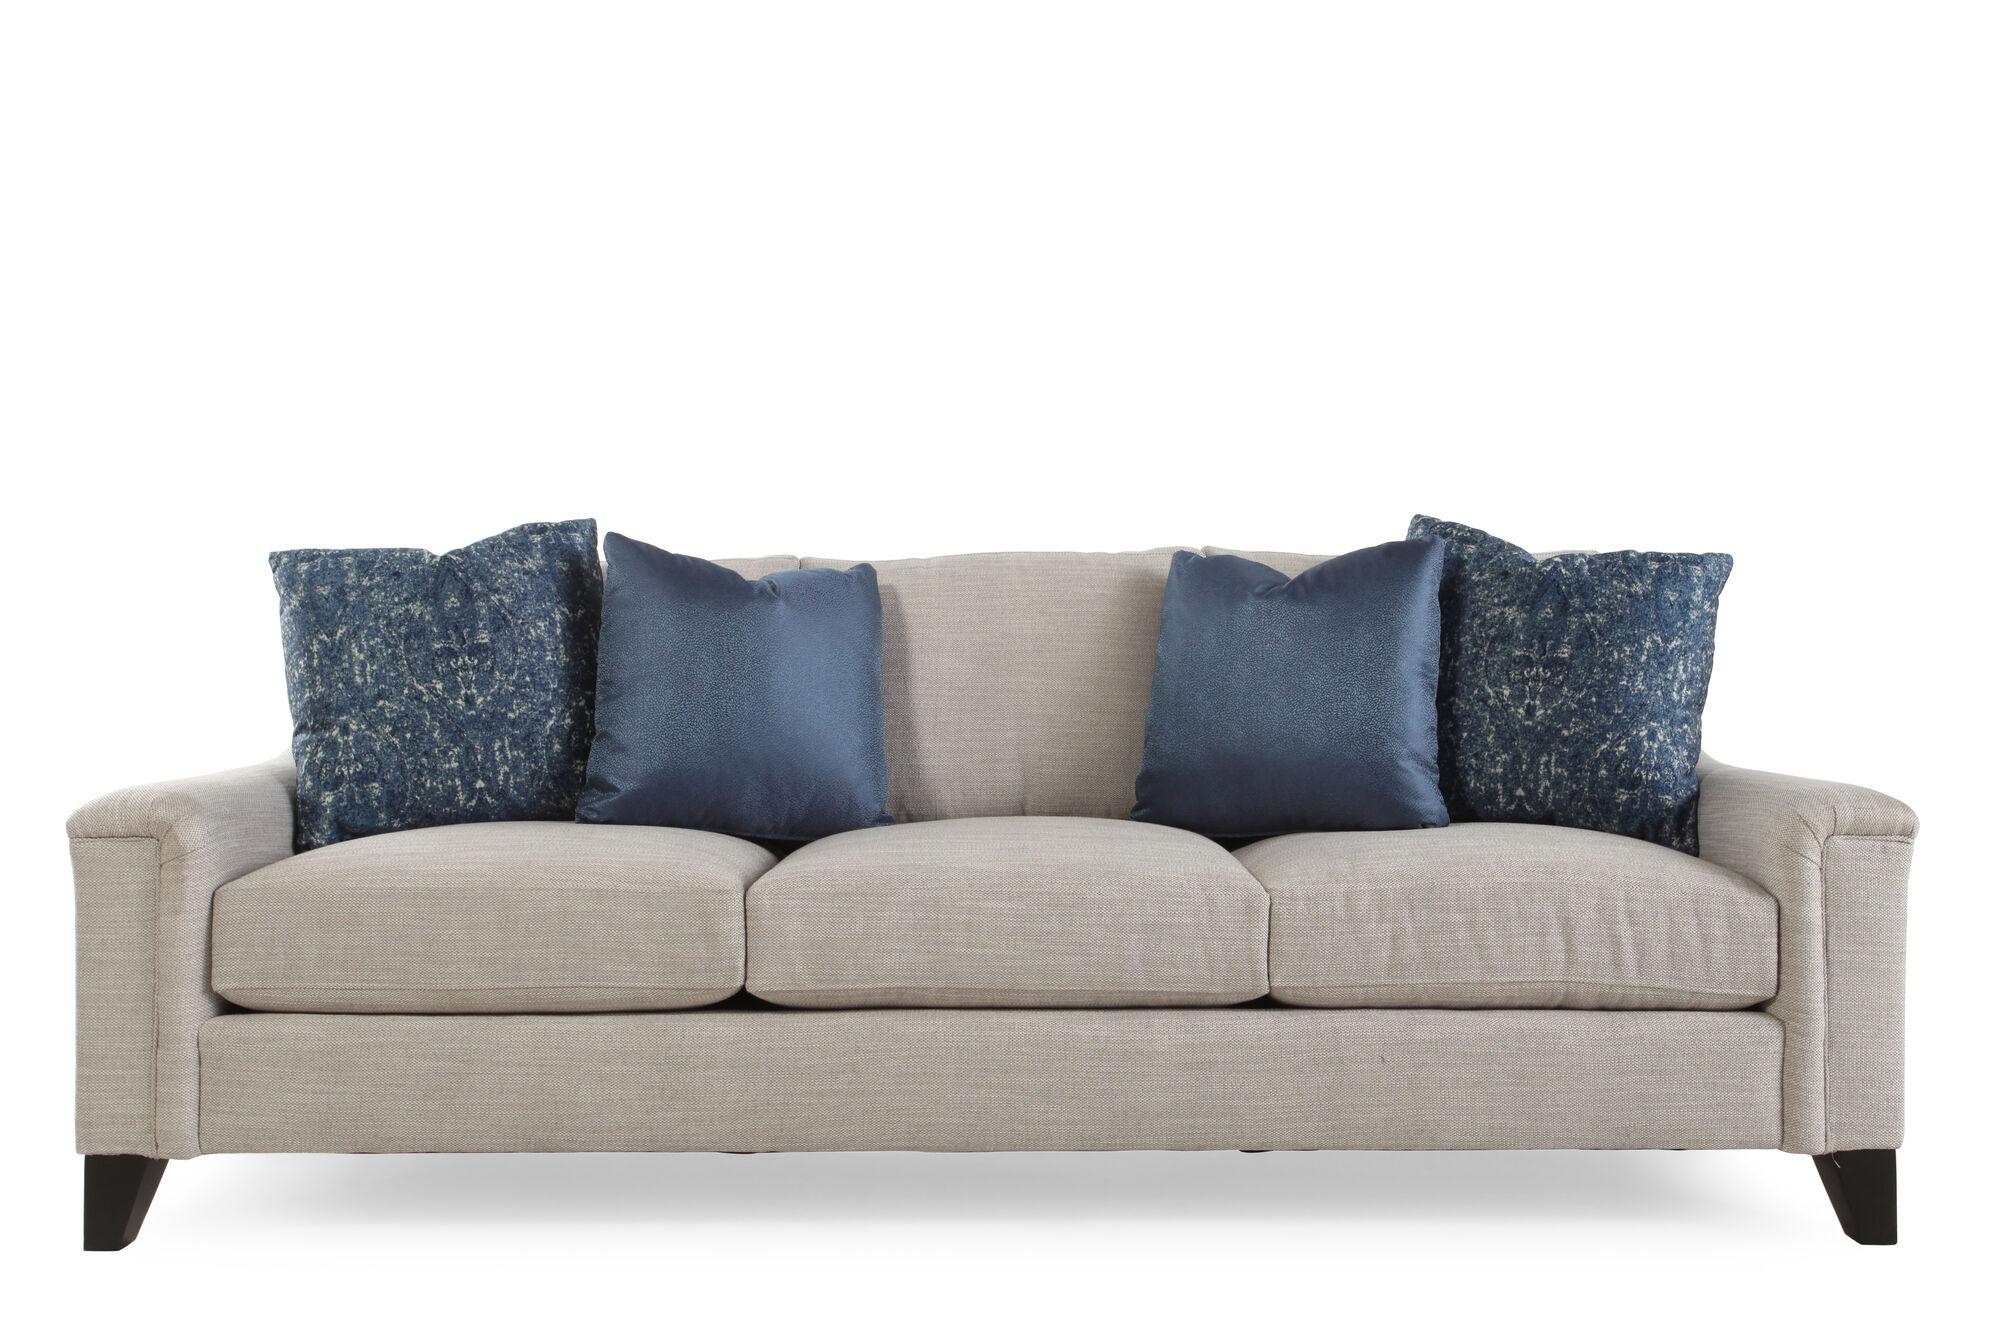 High Profile 93 Metropolitan Sofa